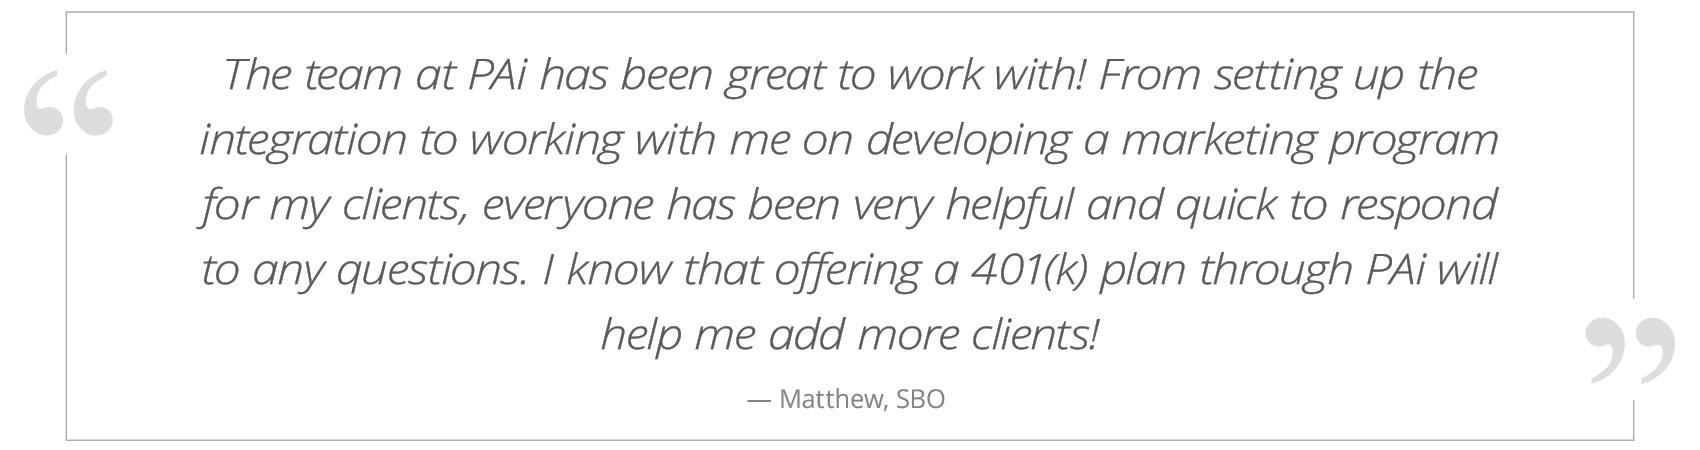 pai-website-testimonial-Matthew-Payroll.png